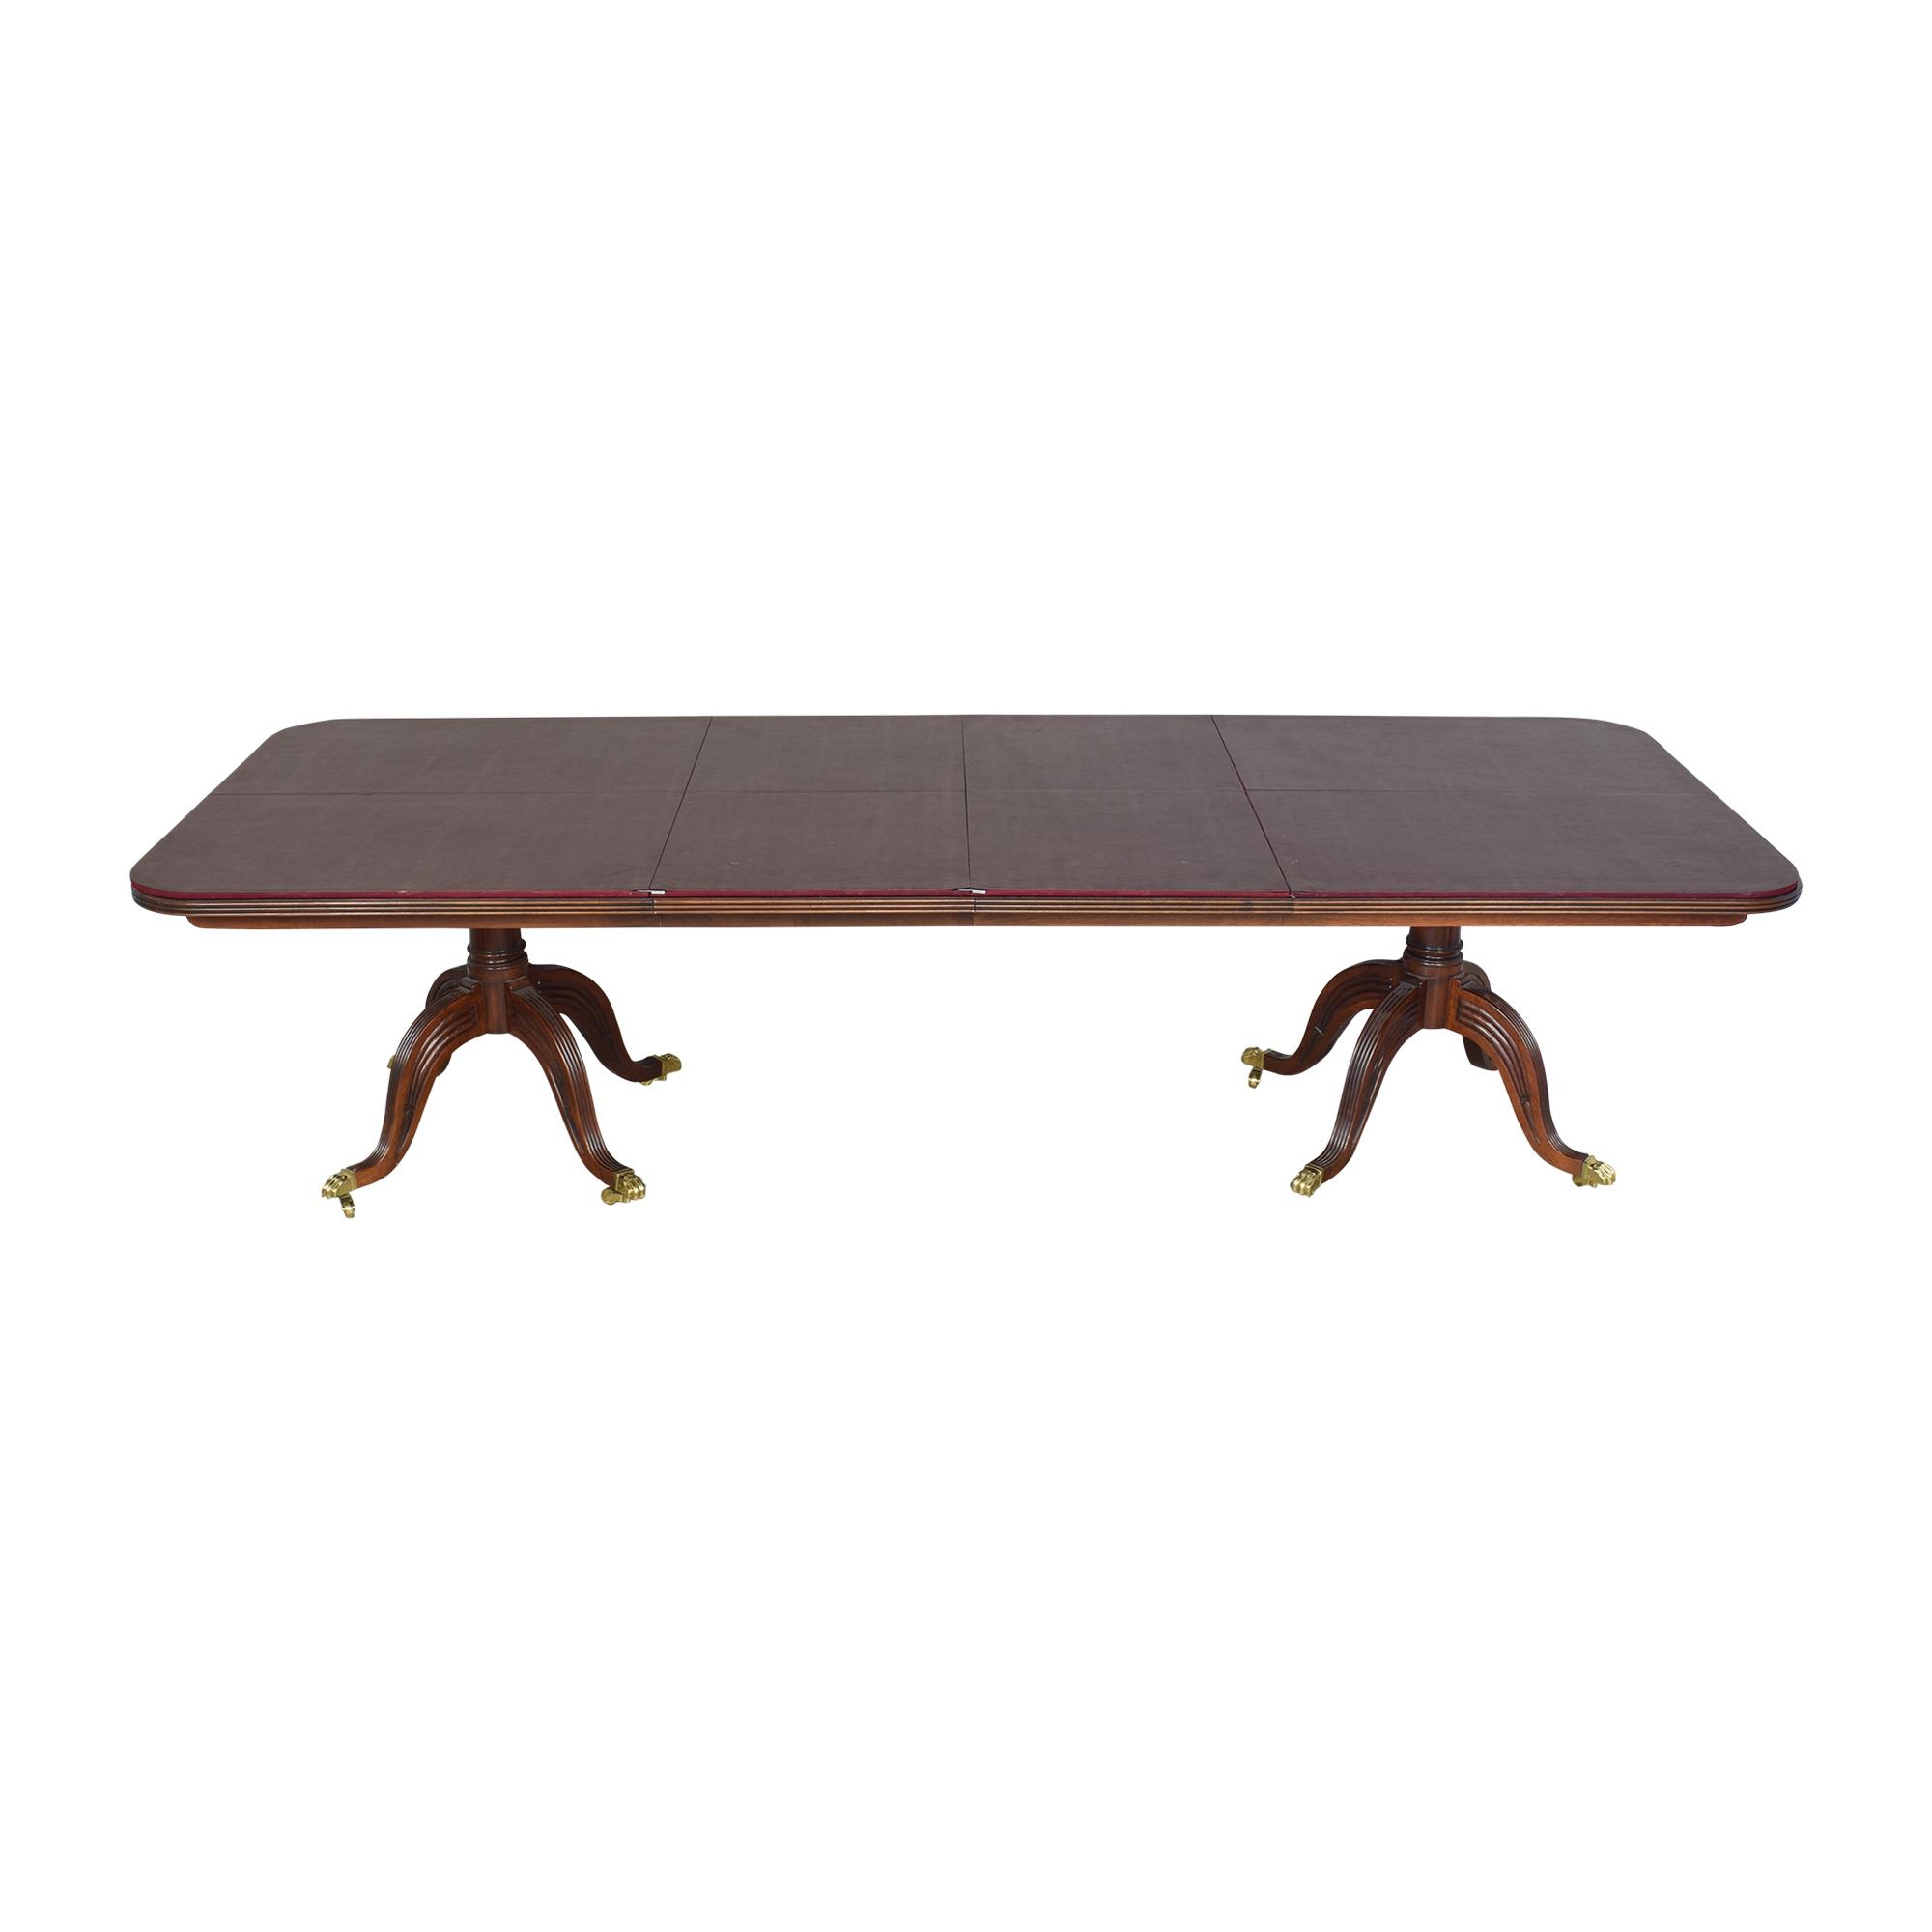 Henredon Double Pedestal Extendable Dining Table sale